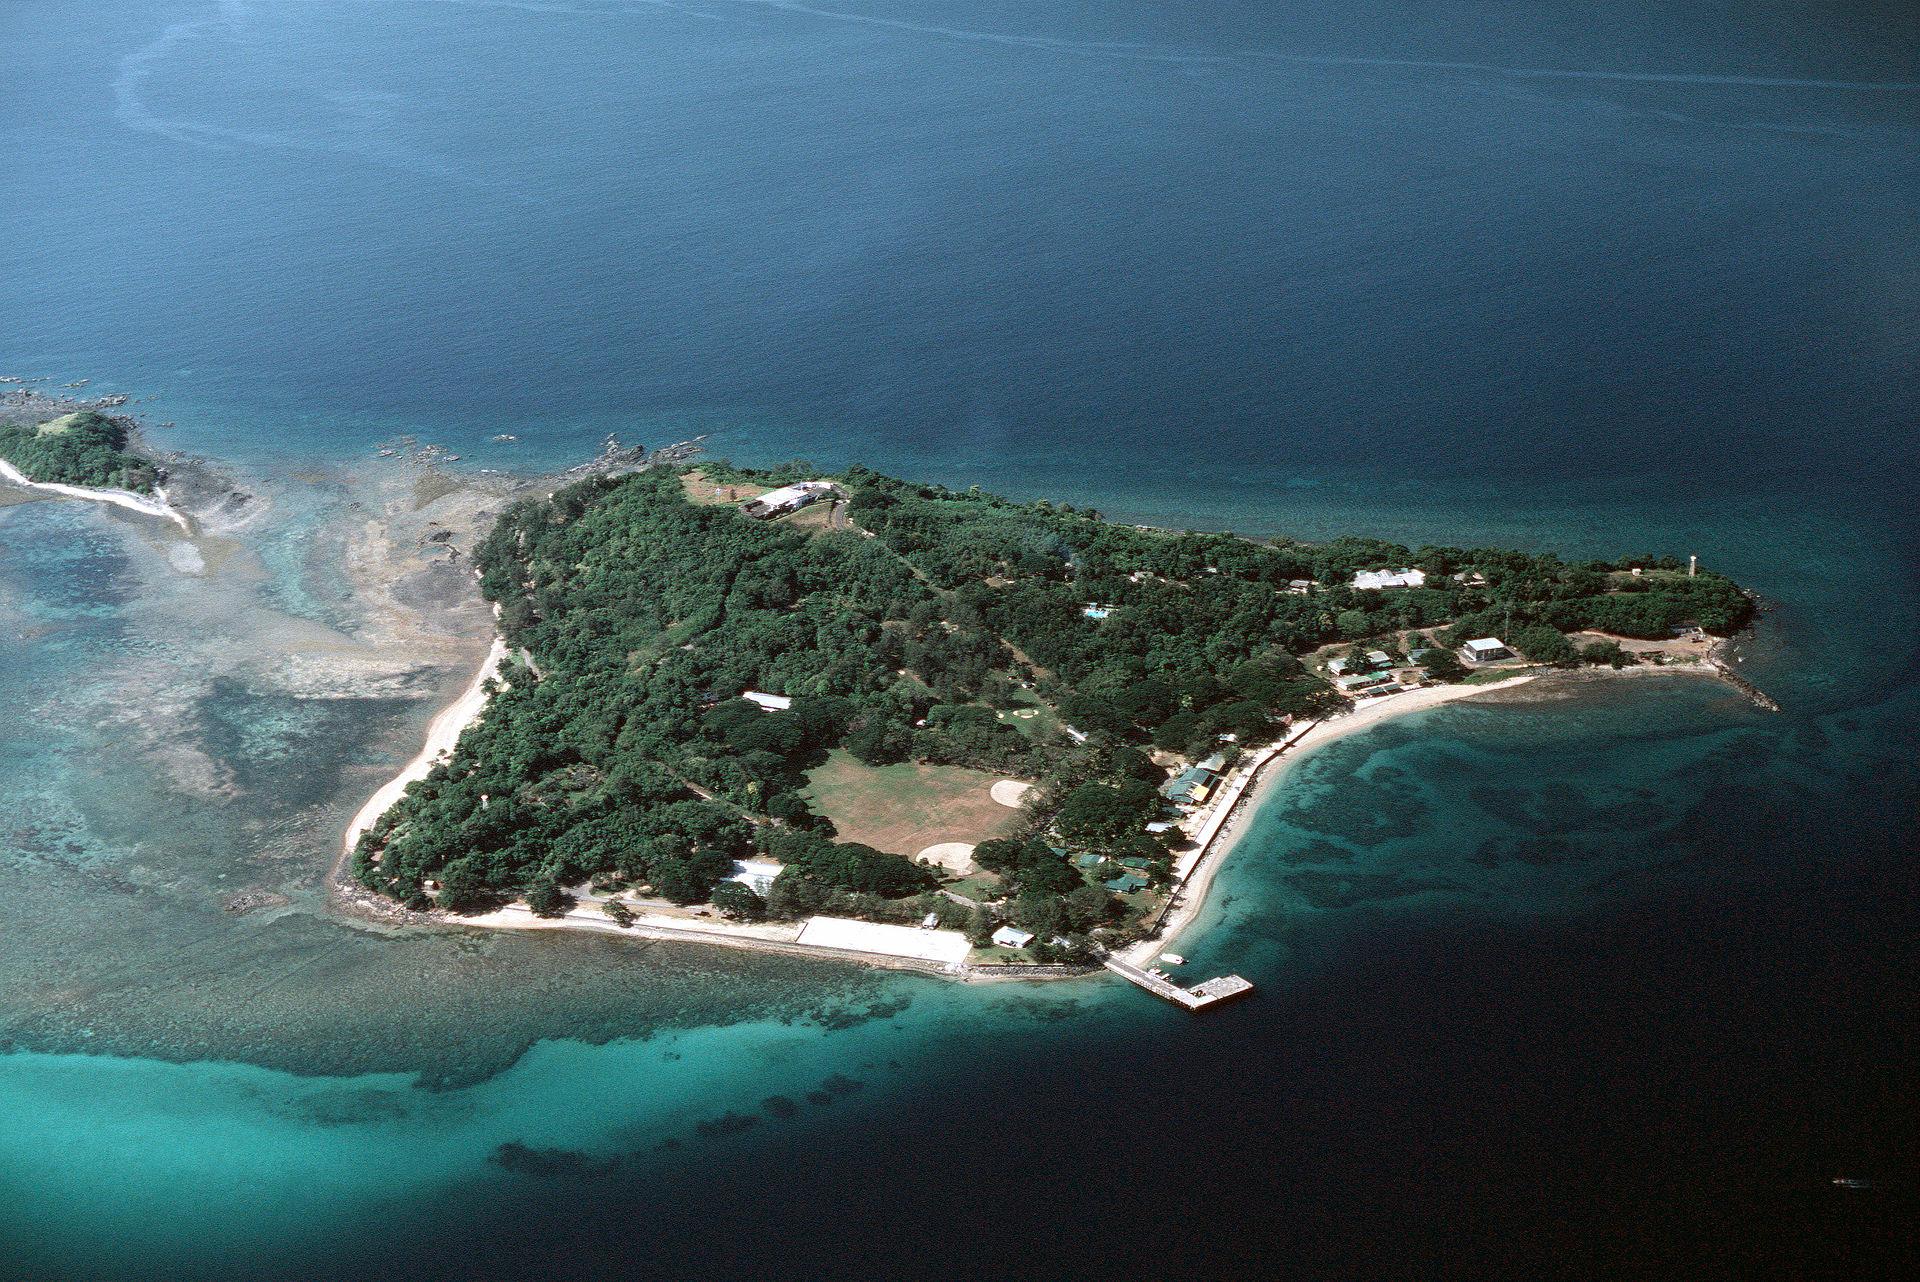 Grande Island Subic Bay Philippines